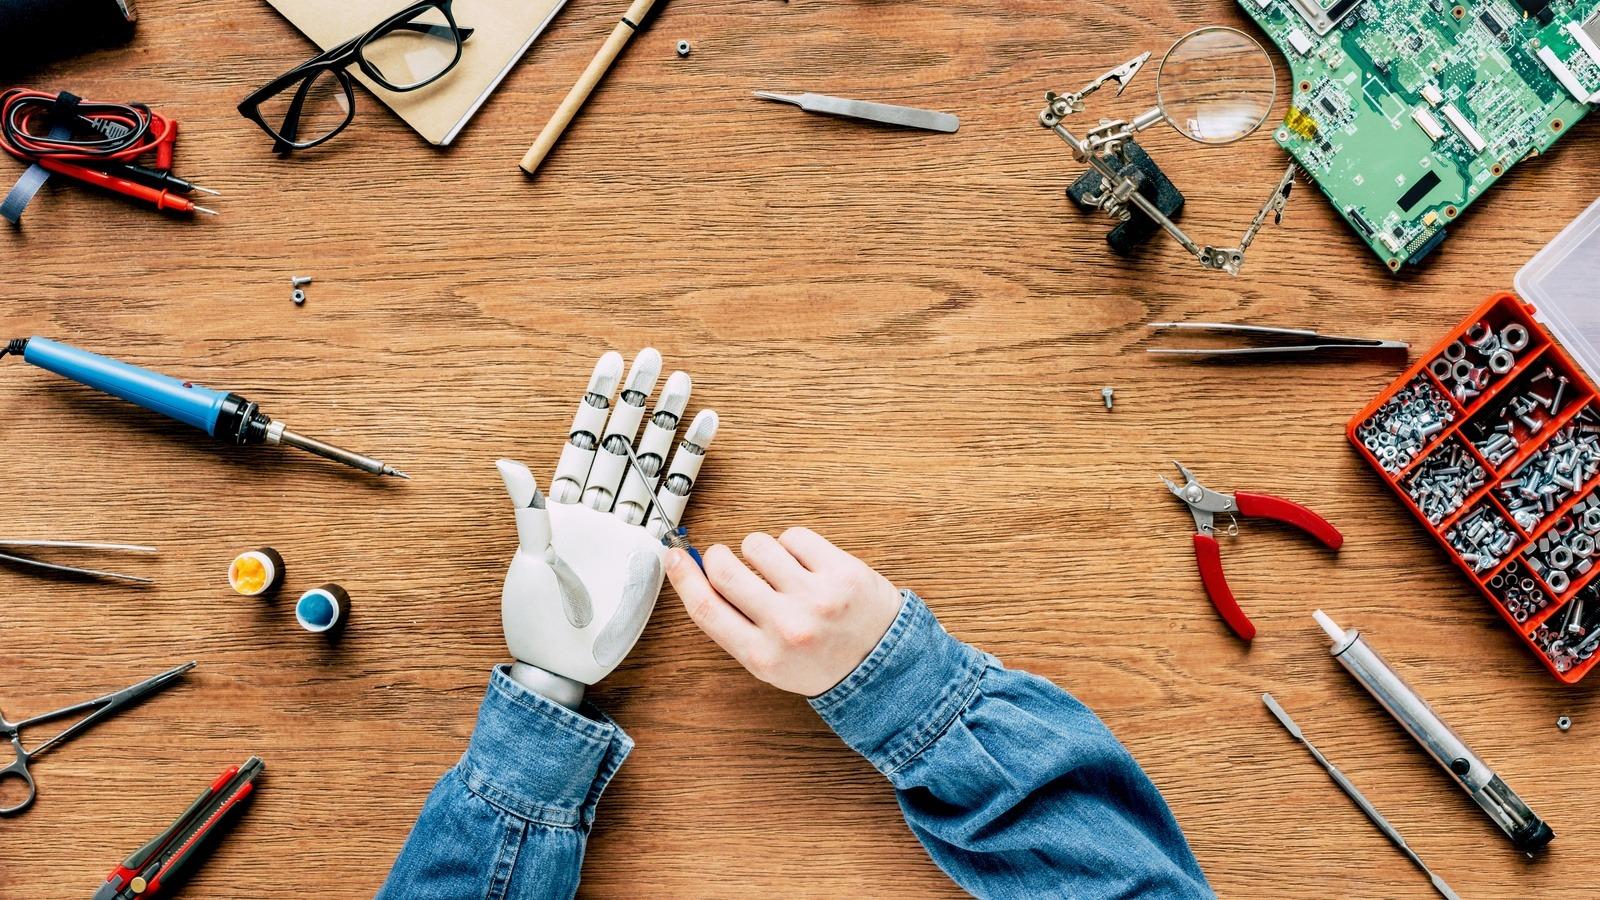 man-fixing-robotic-hand-by-screwdriver.jpg